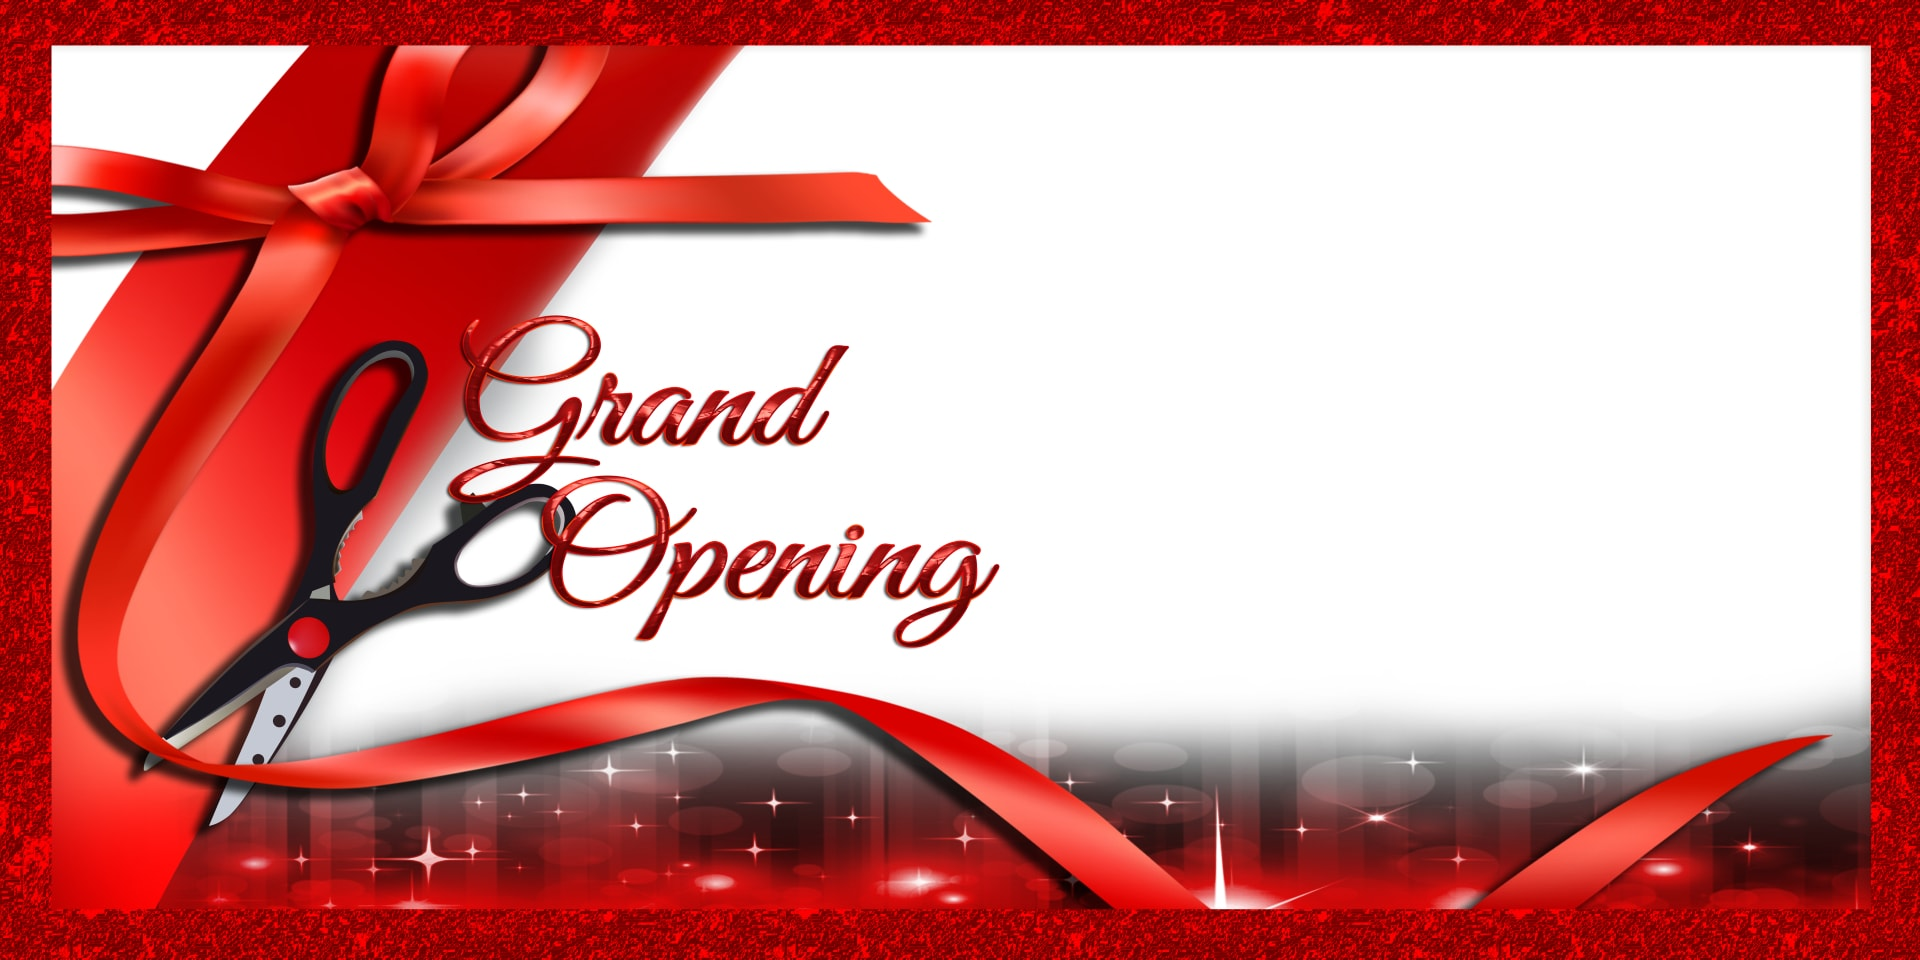 grand opening banner near mealexacustombanners com alexacustombanners com